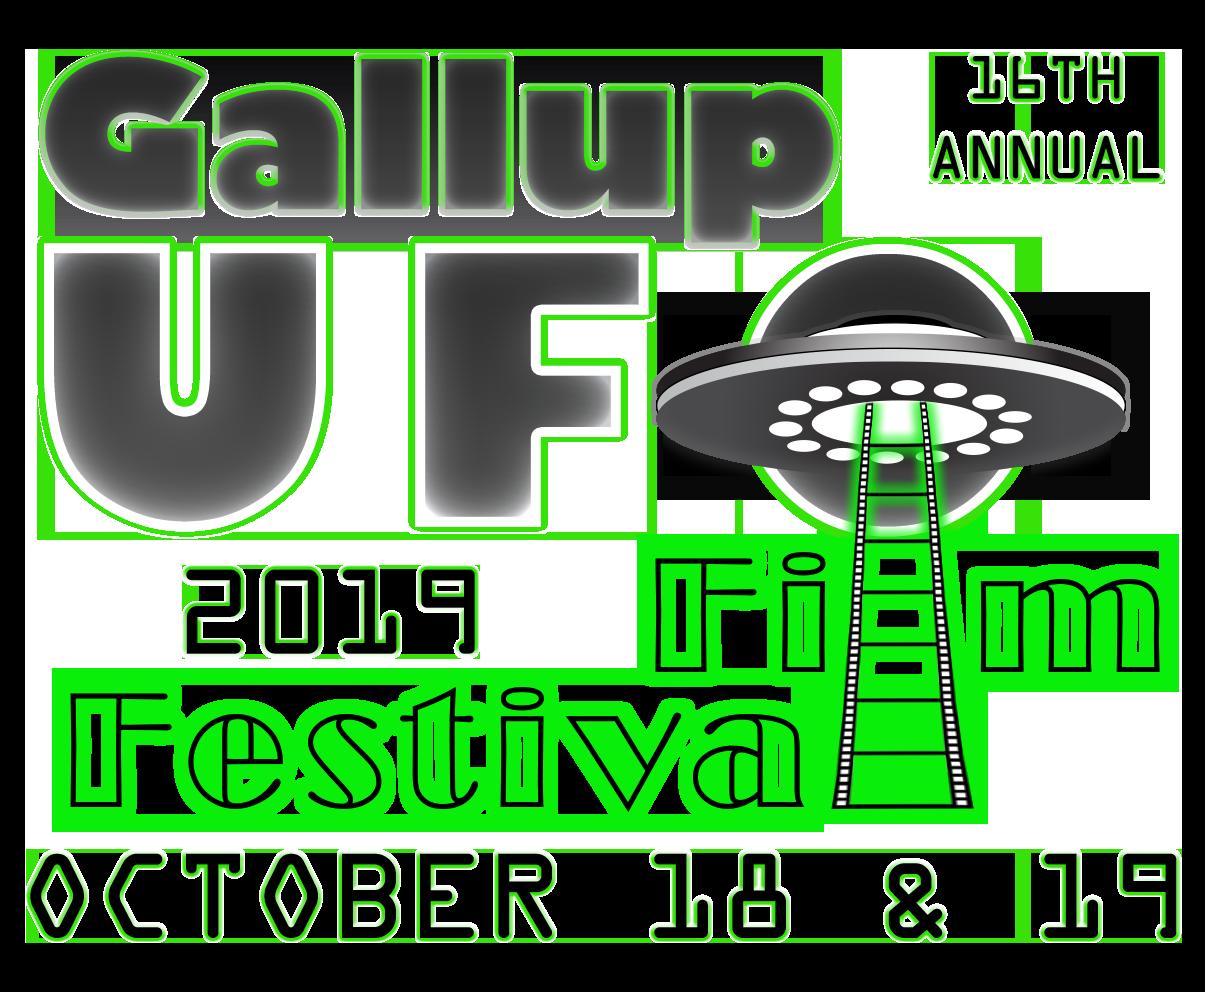 glpUFO_logo-date